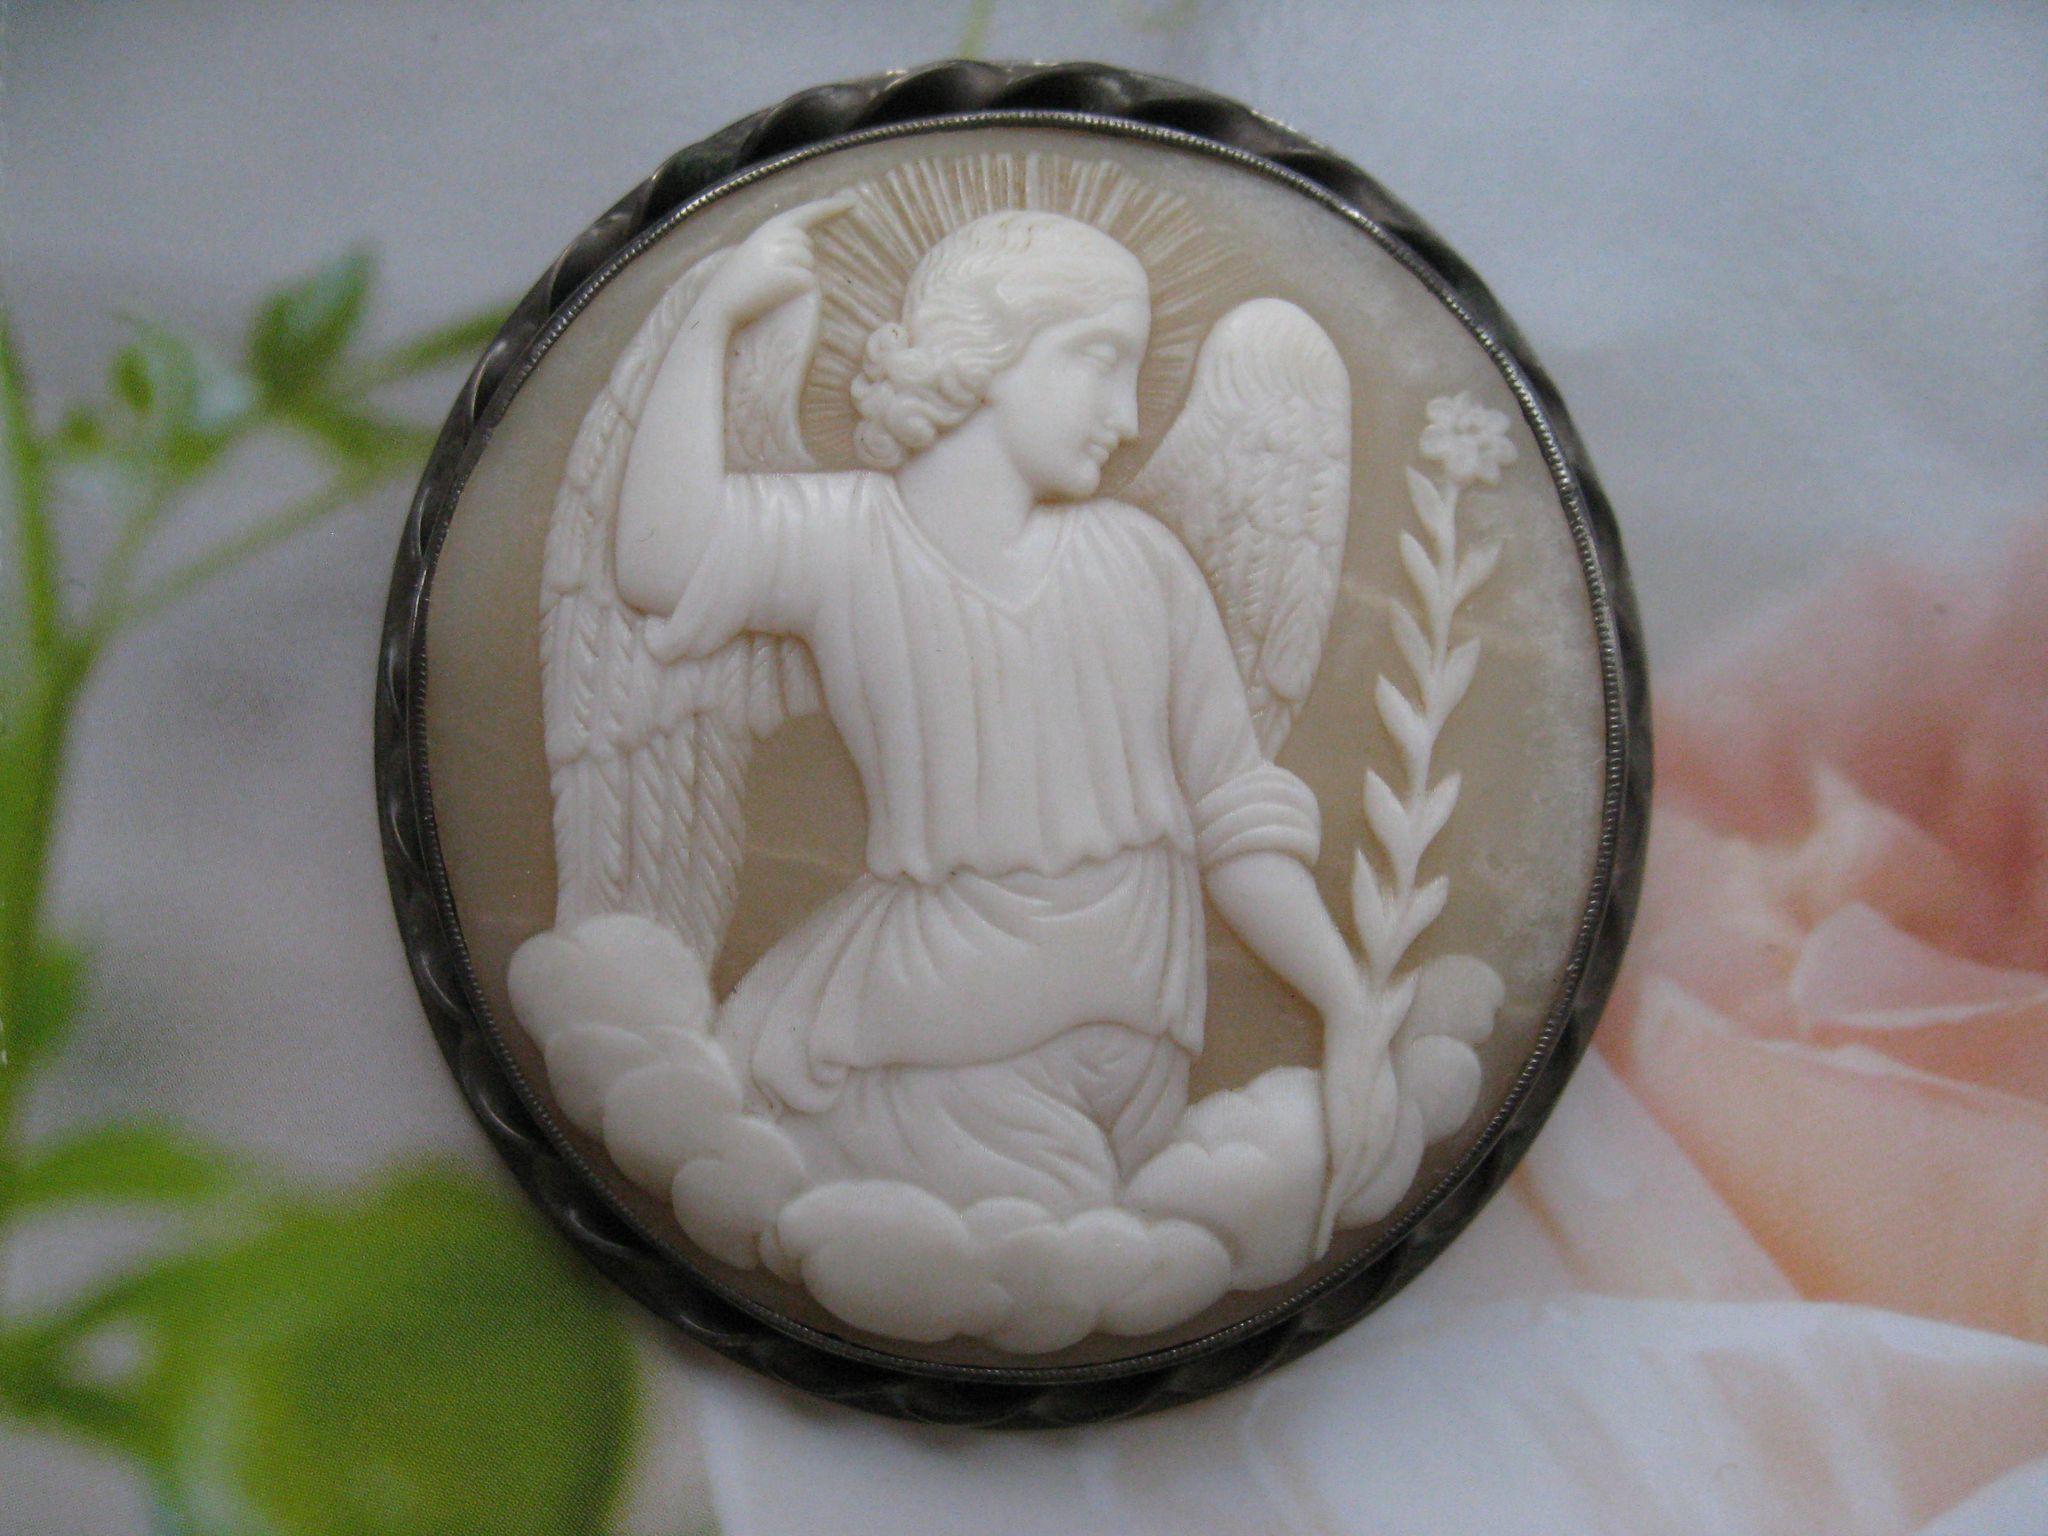 Antique Archangel Gabriel Cameo Pin, Saints Cameo